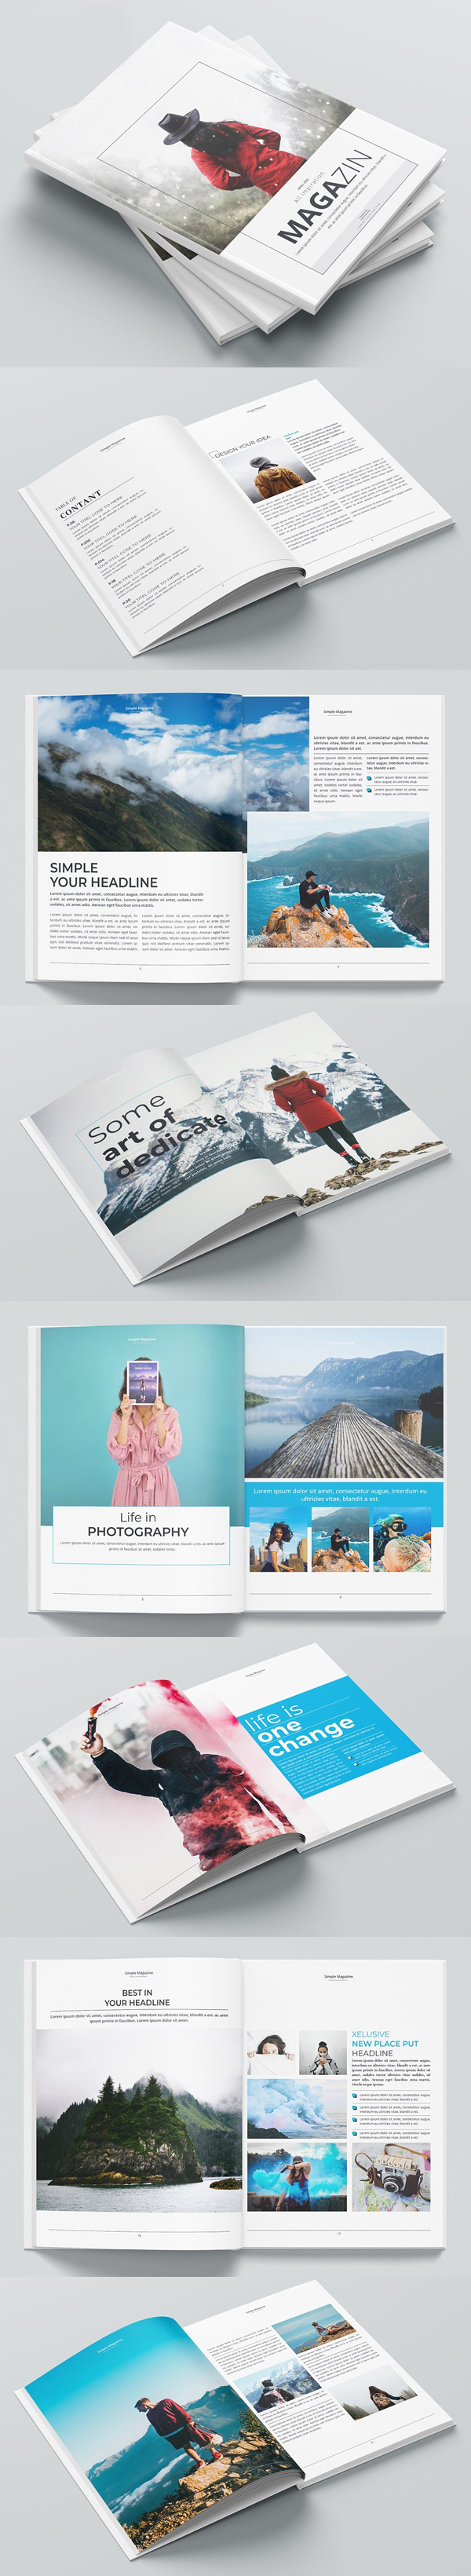 Simple Business Magazine Brochure